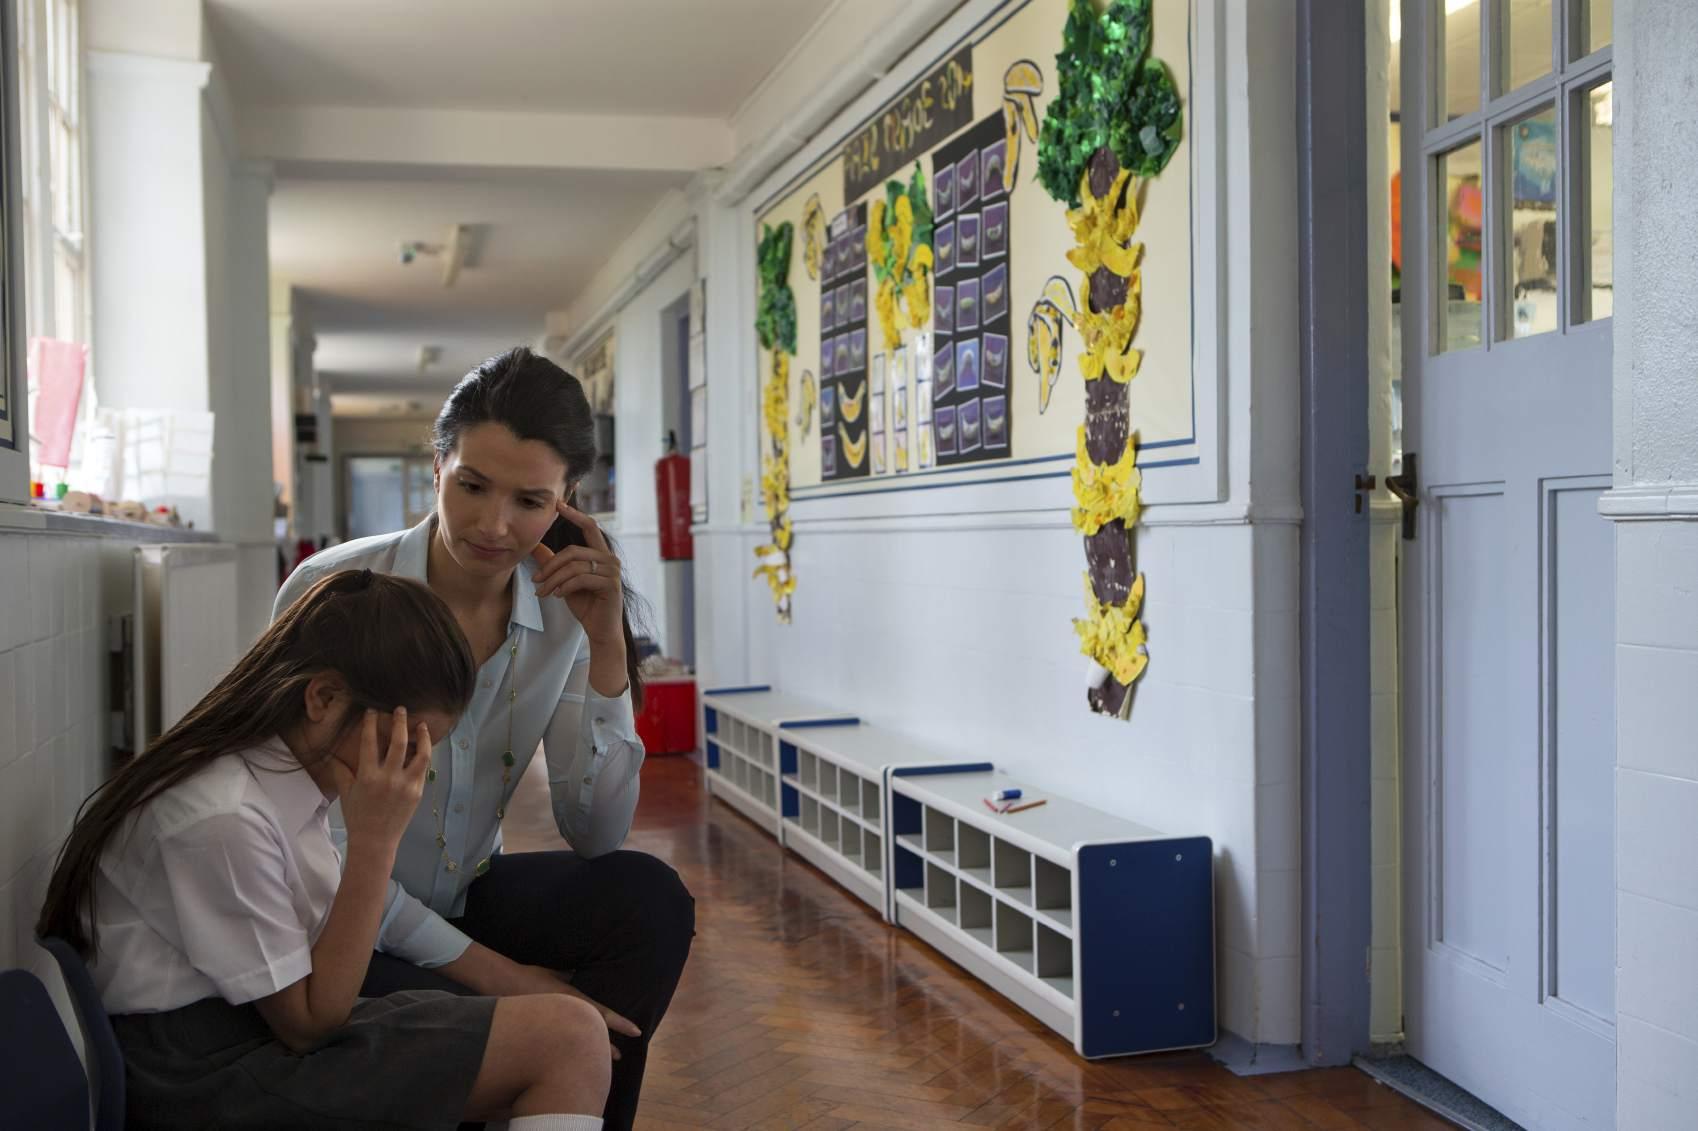 Teacher with an upset student